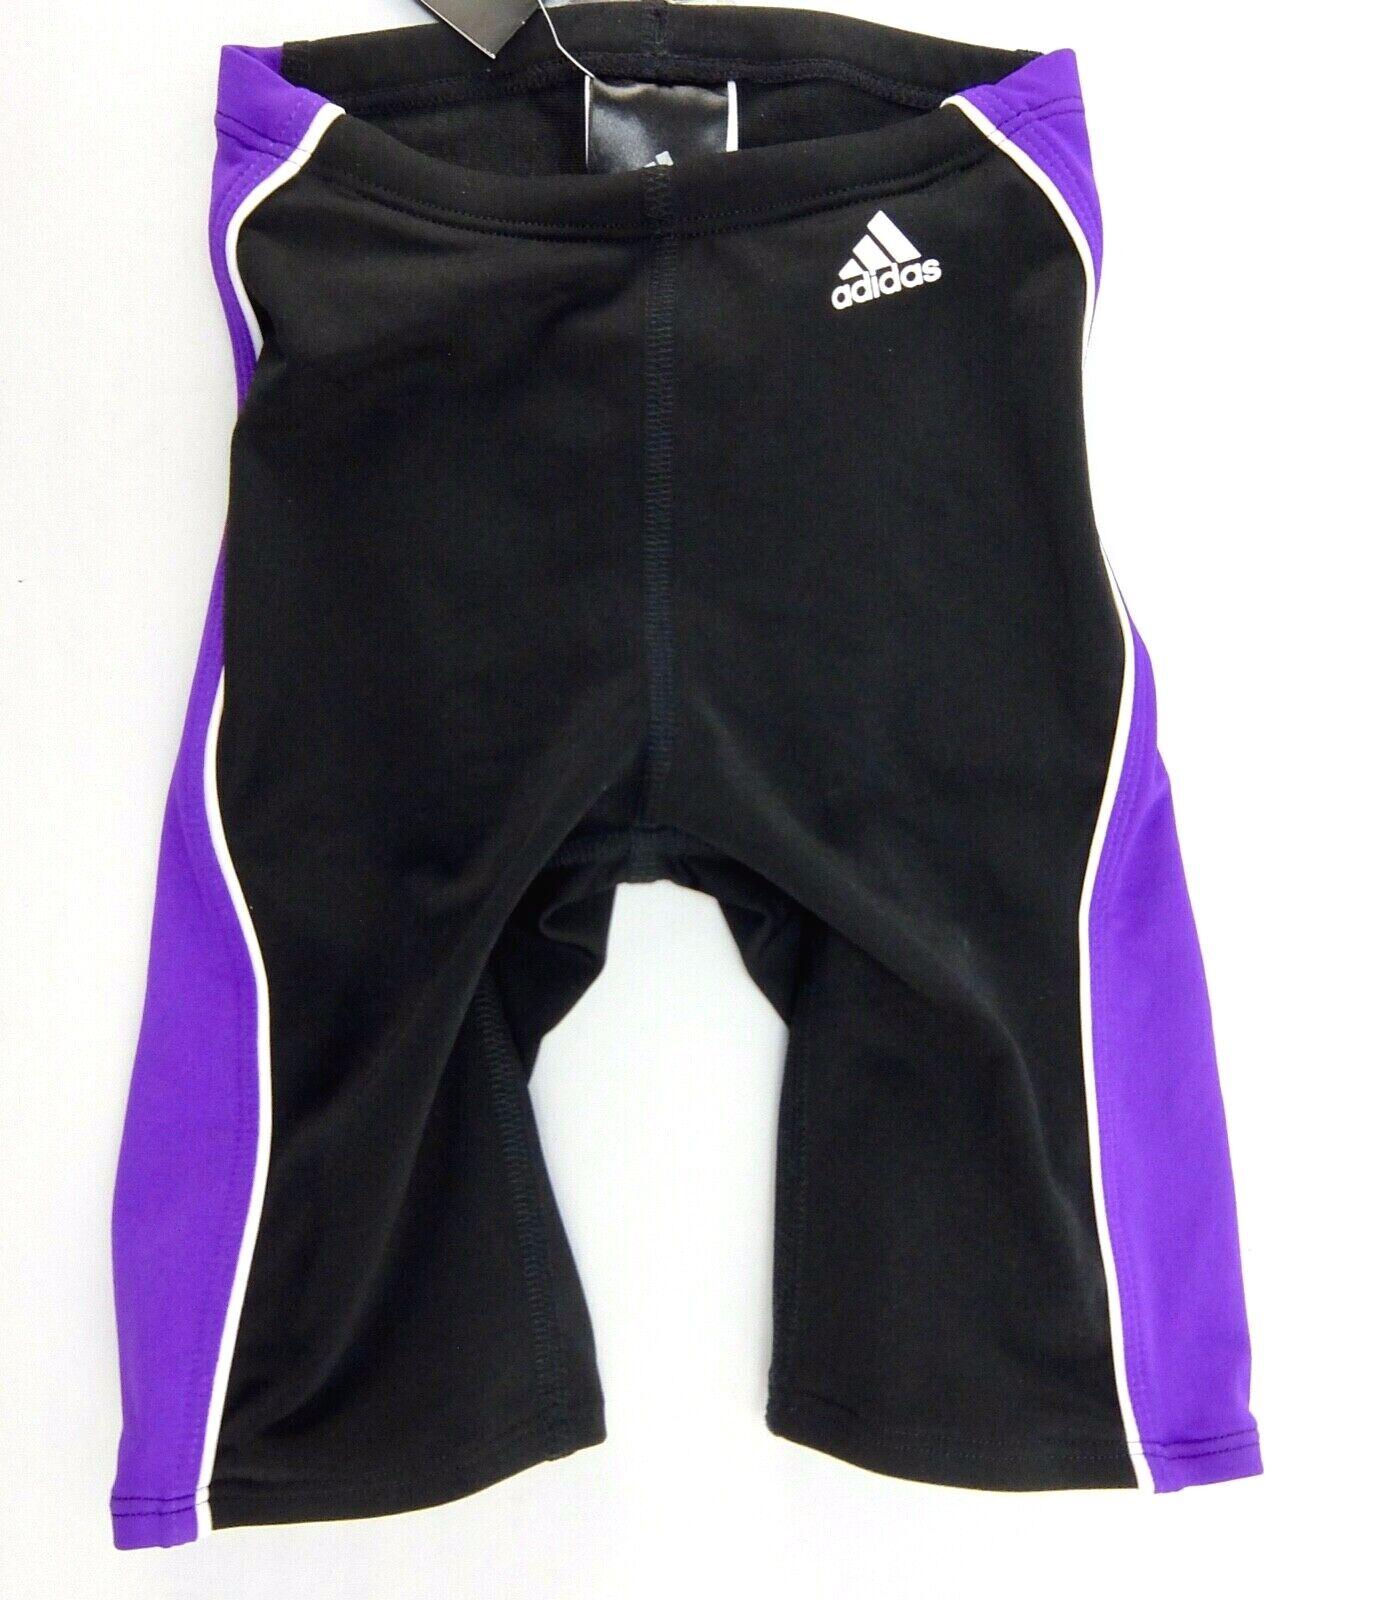 Adidas Boys Flex Splice Jammer Swim Suit Black Purple Polyes